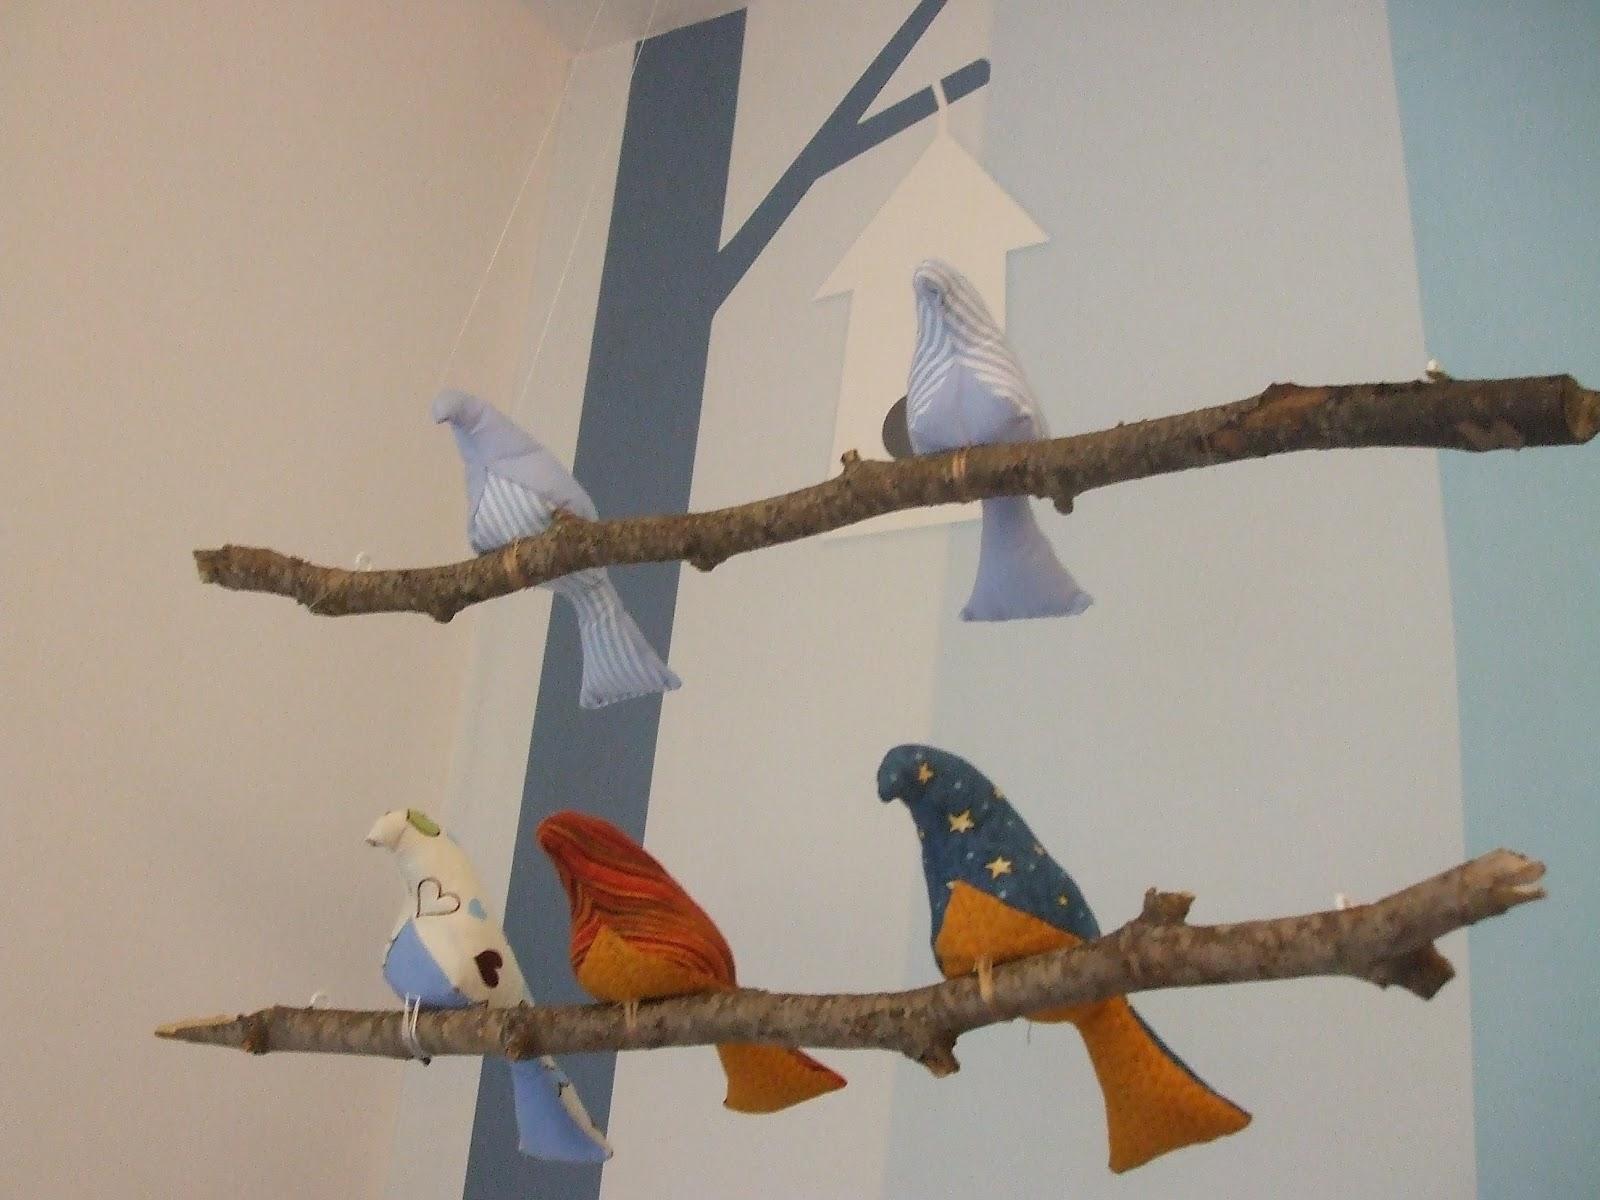 Móvil de pájaros / Bird Mobile